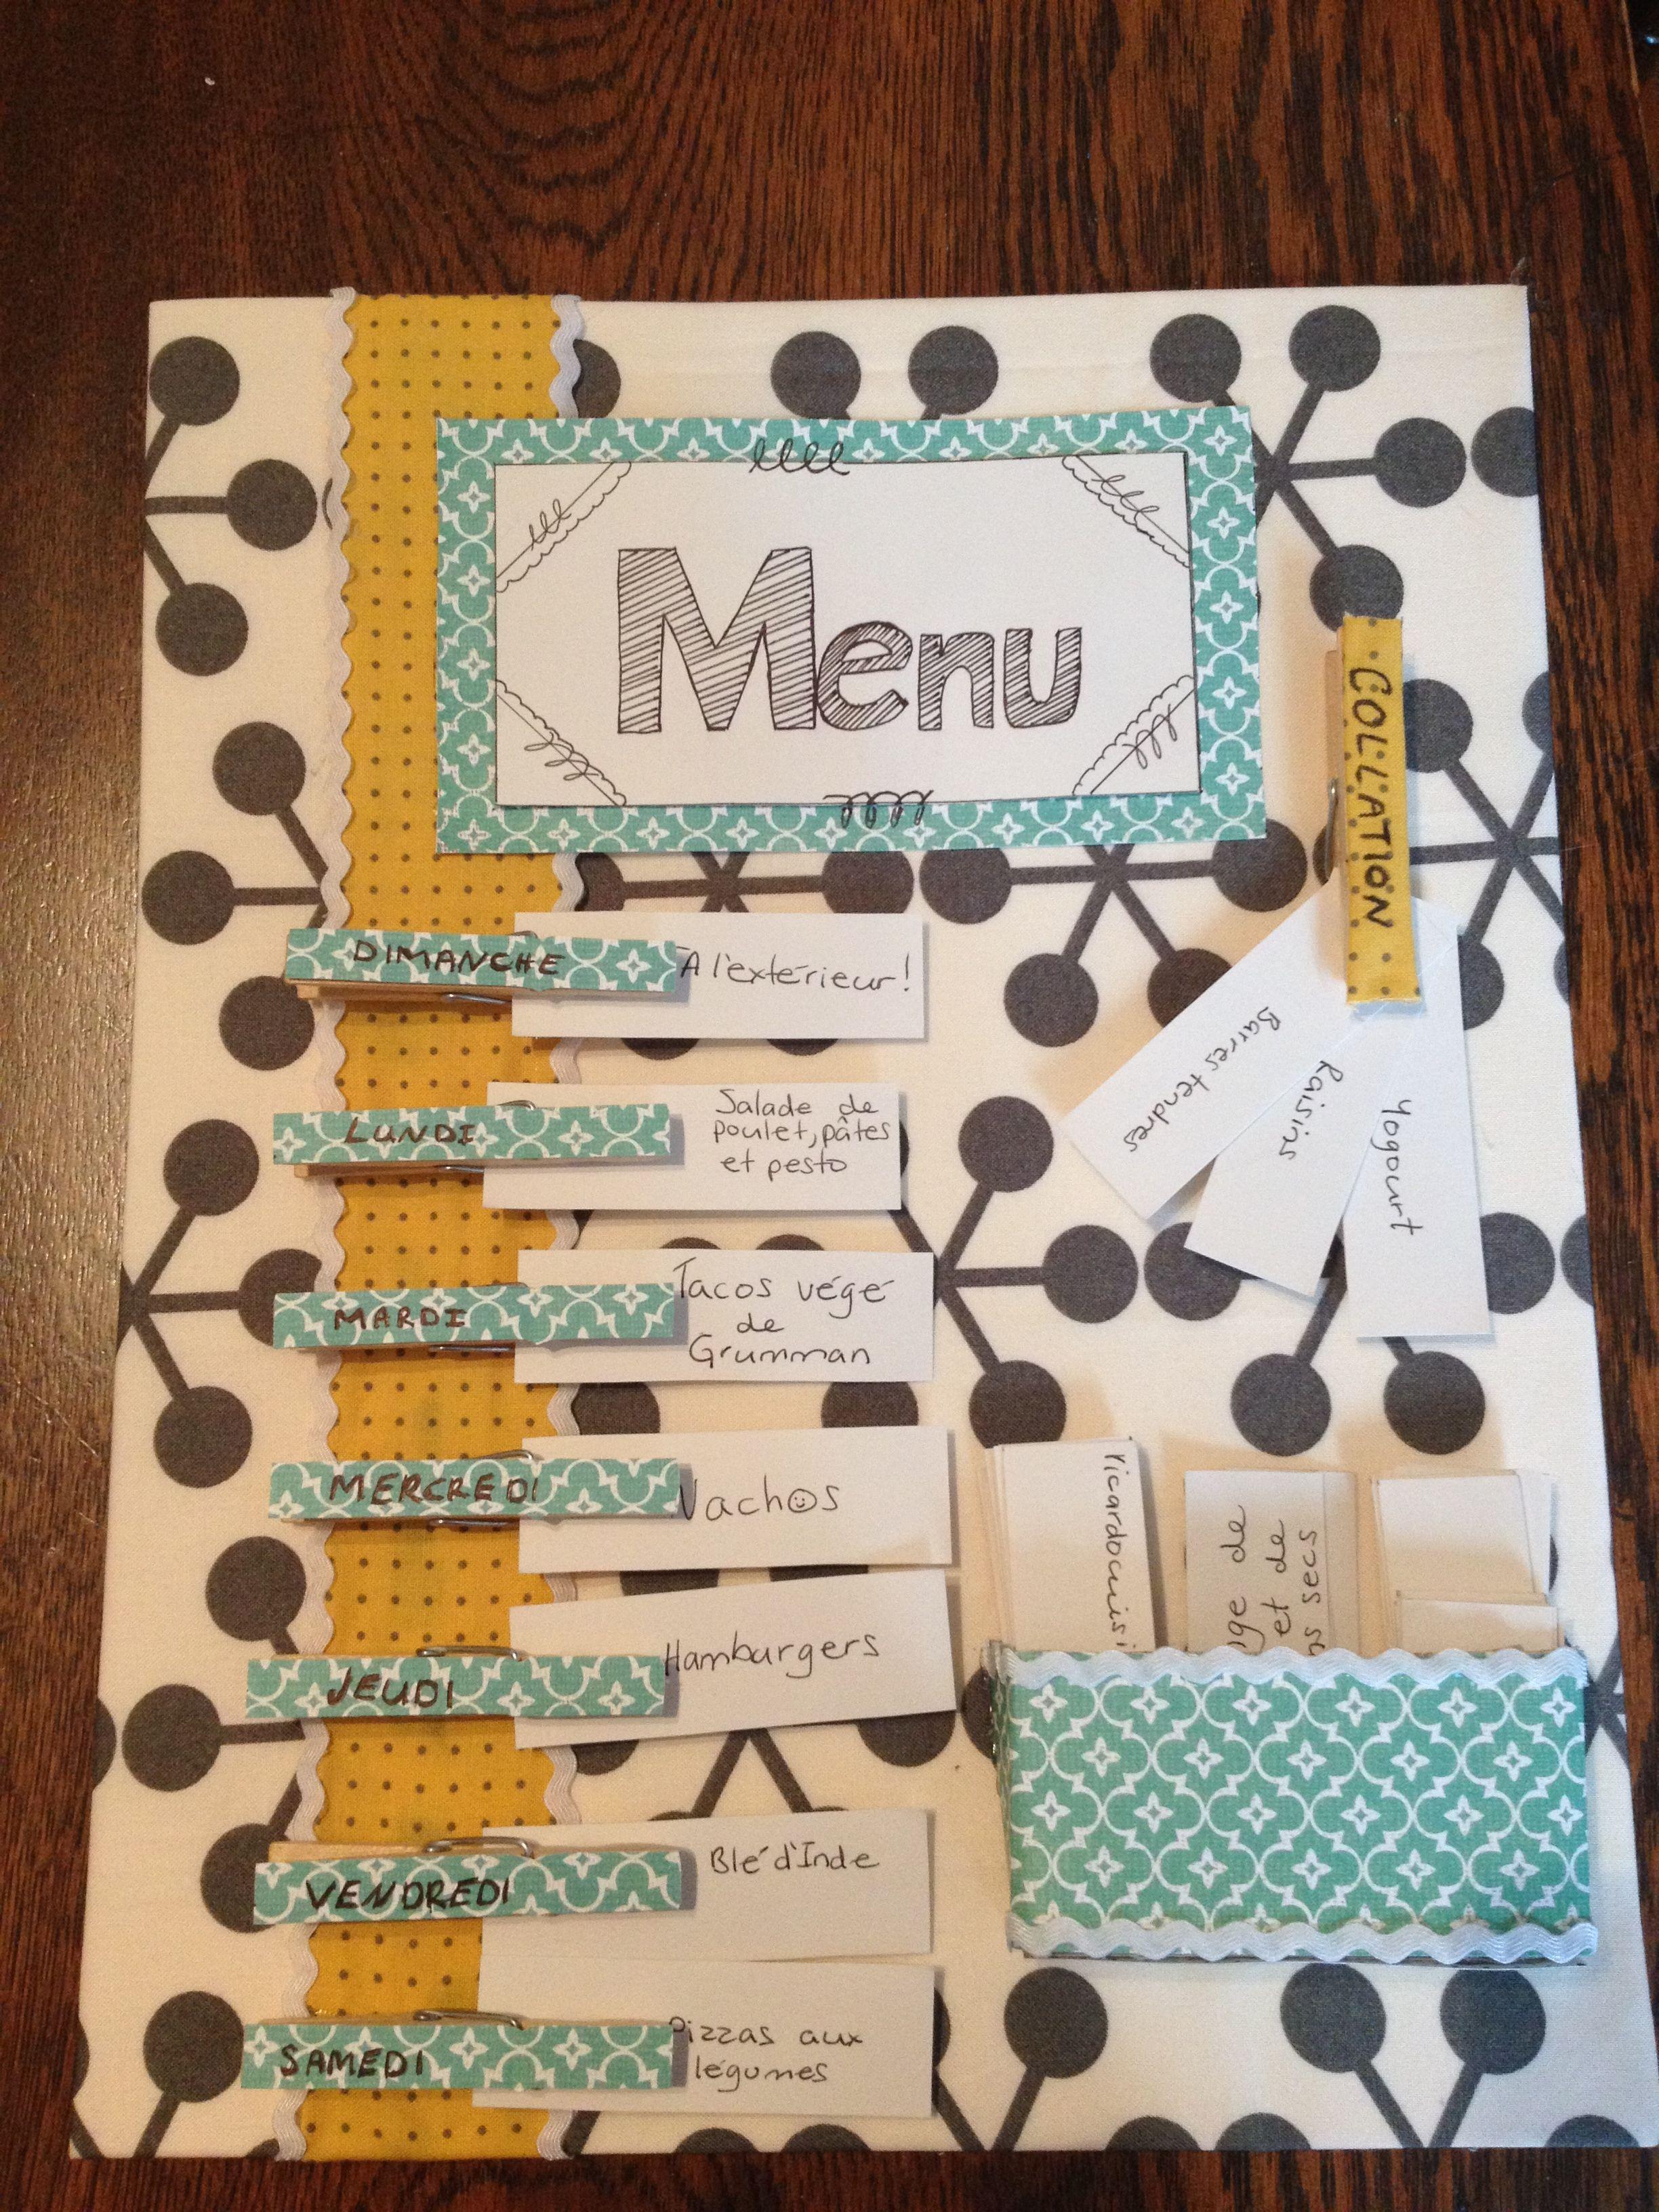 ma premi re cr ation menu de la semaine tr s utile pour. Black Bedroom Furniture Sets. Home Design Ideas